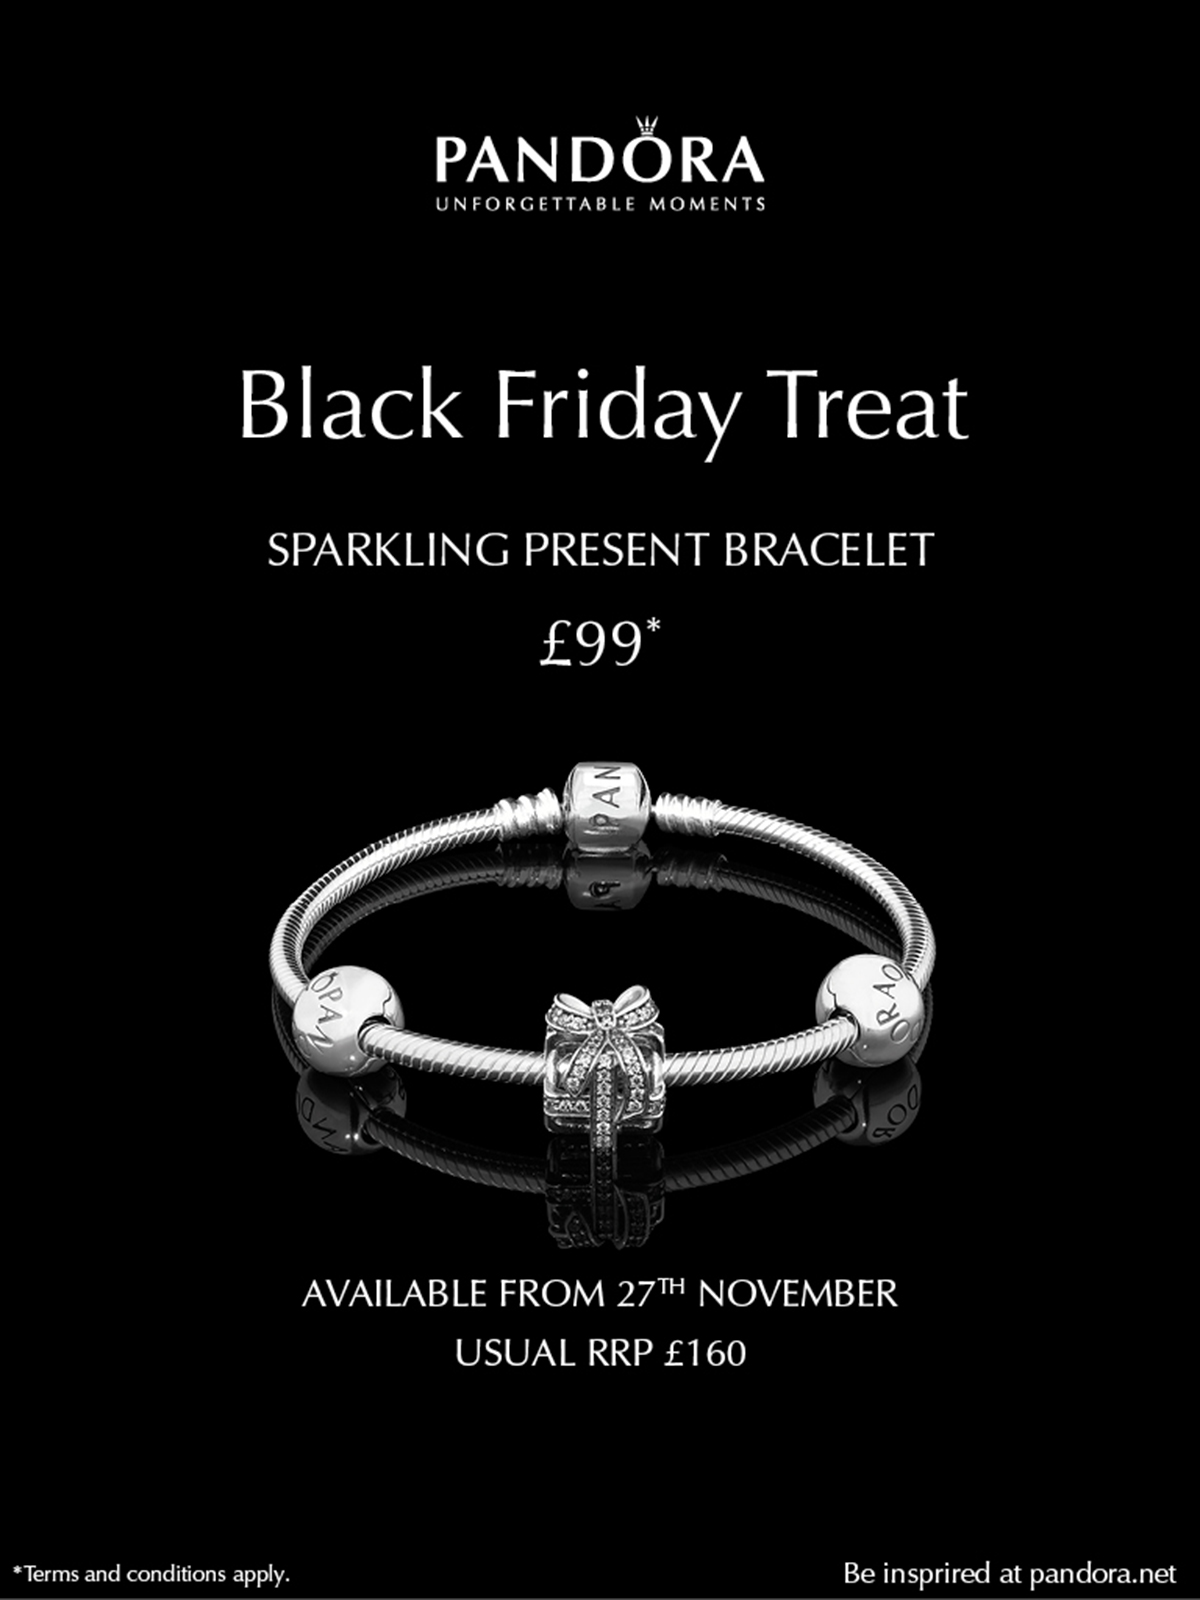 363c54c5ed3f6 pandora bracelet black friday